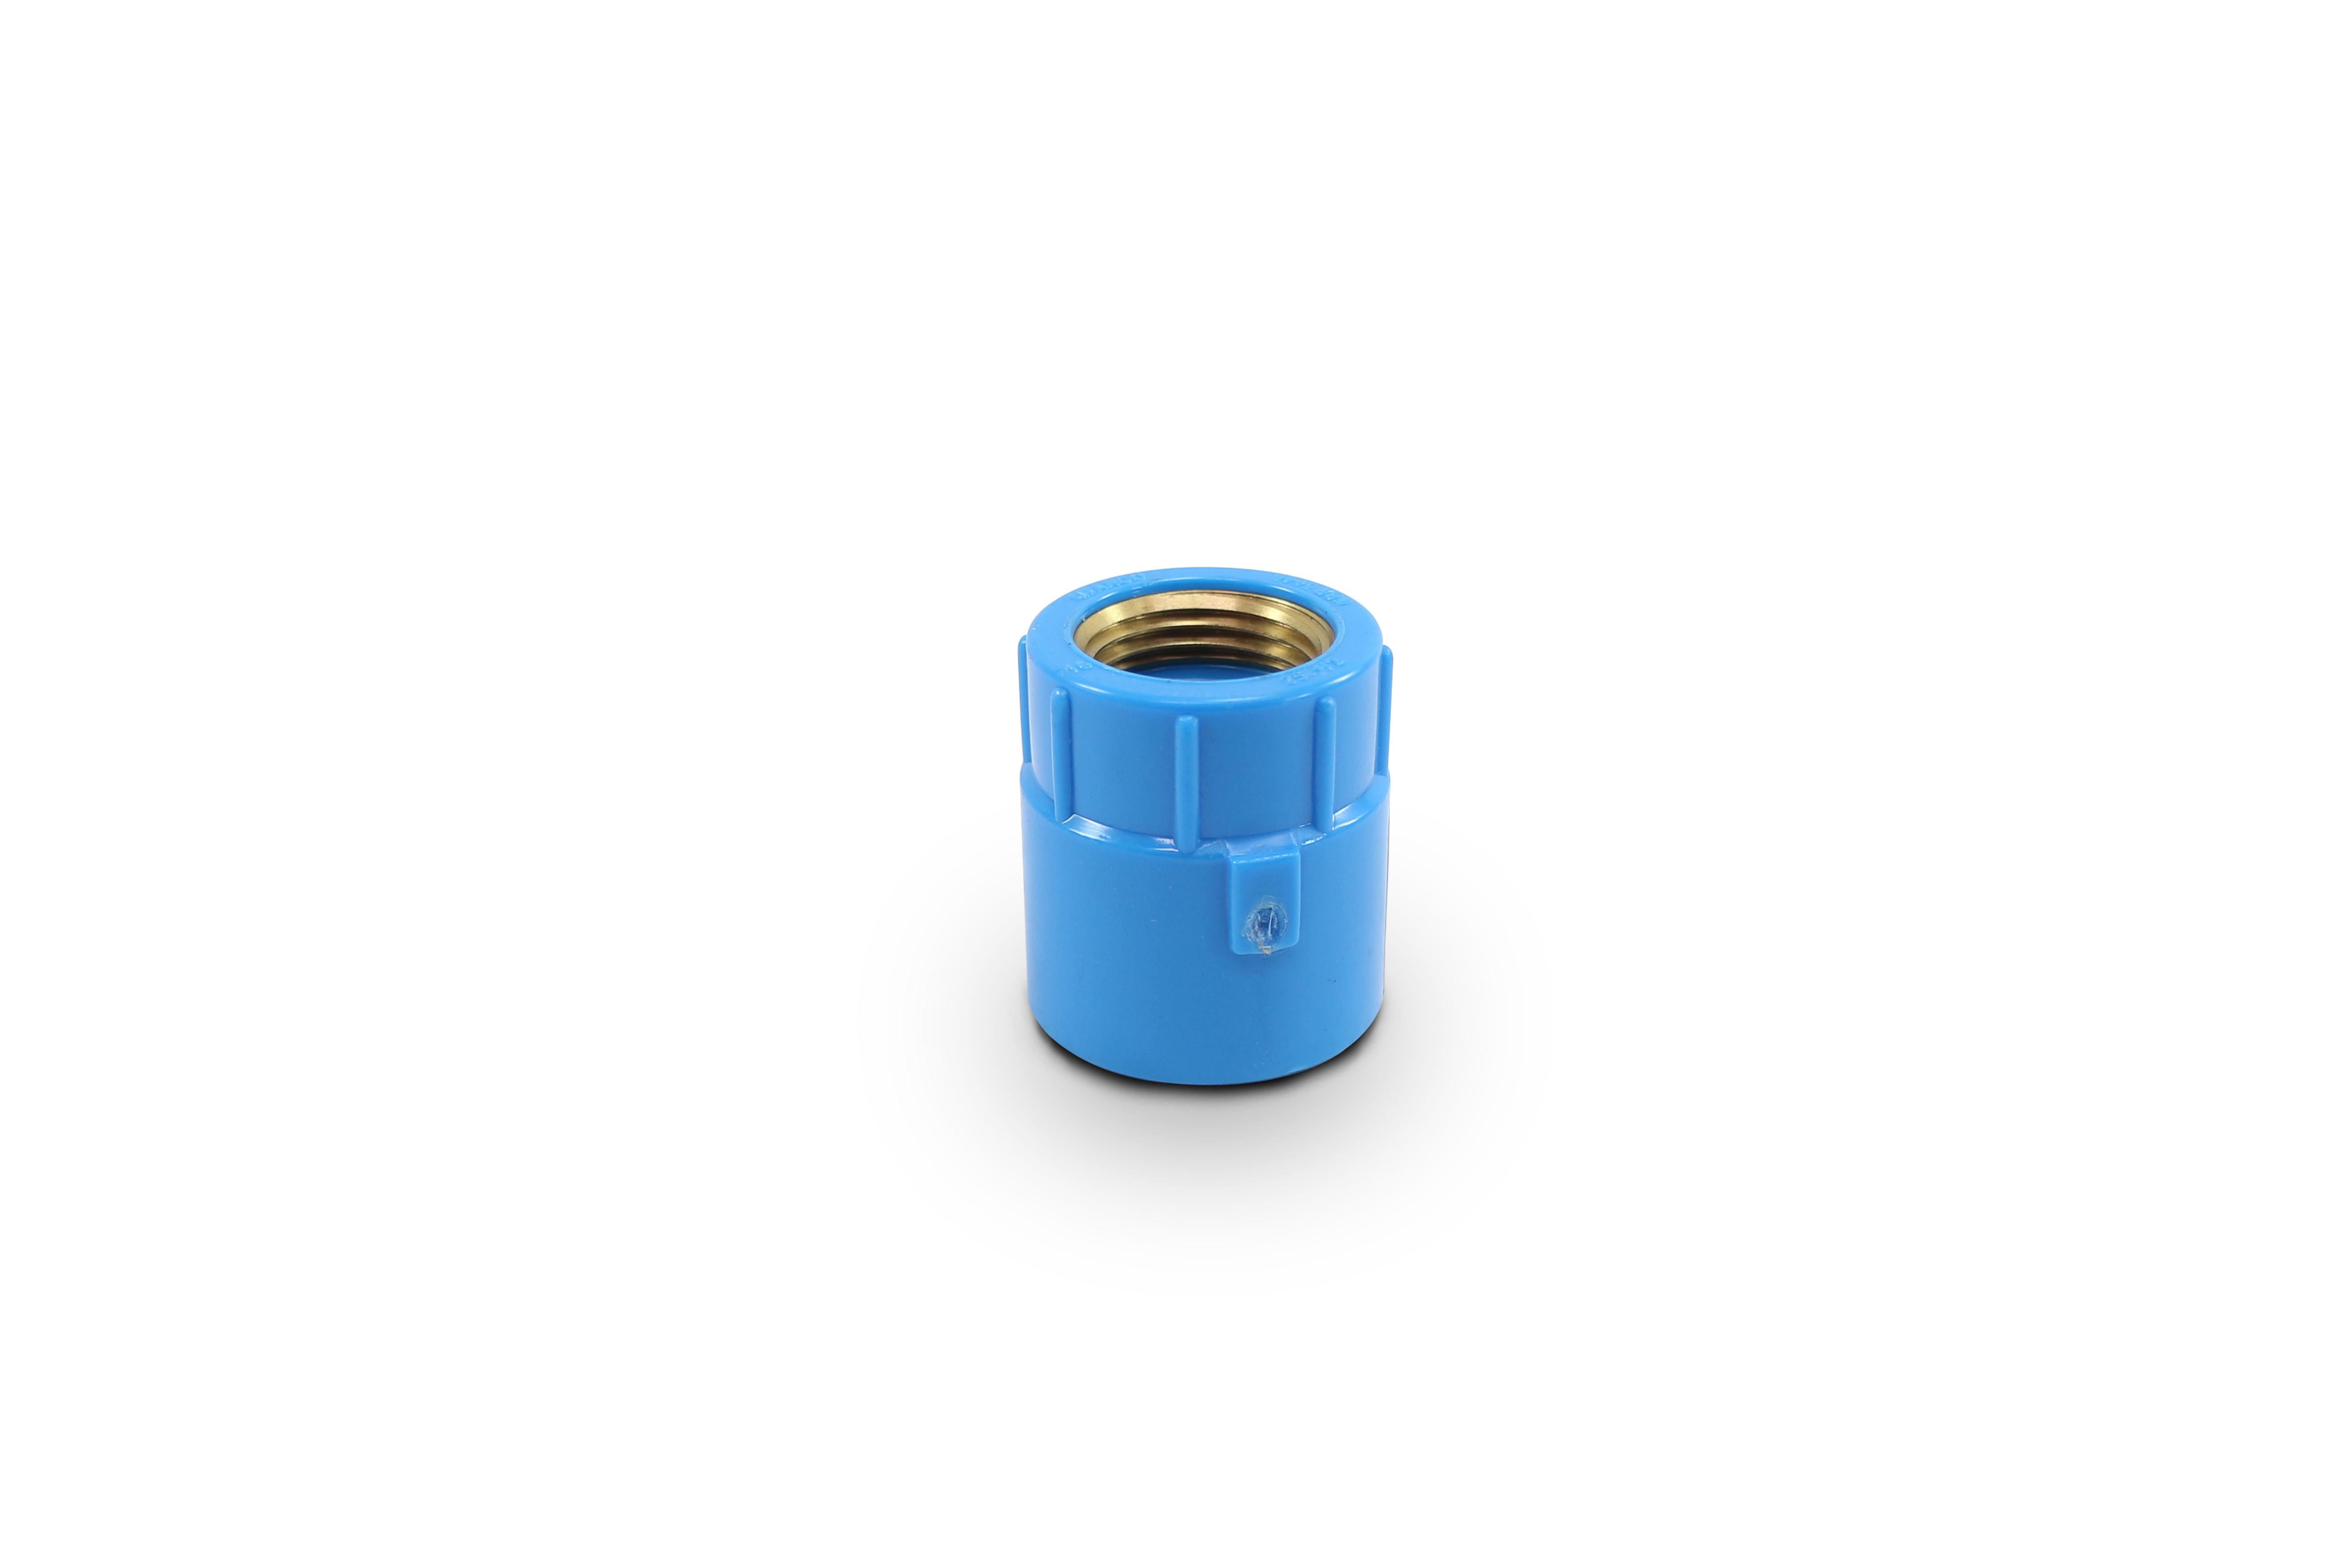 Luva Roscável LR Azul 25mm X 20mm Multilit